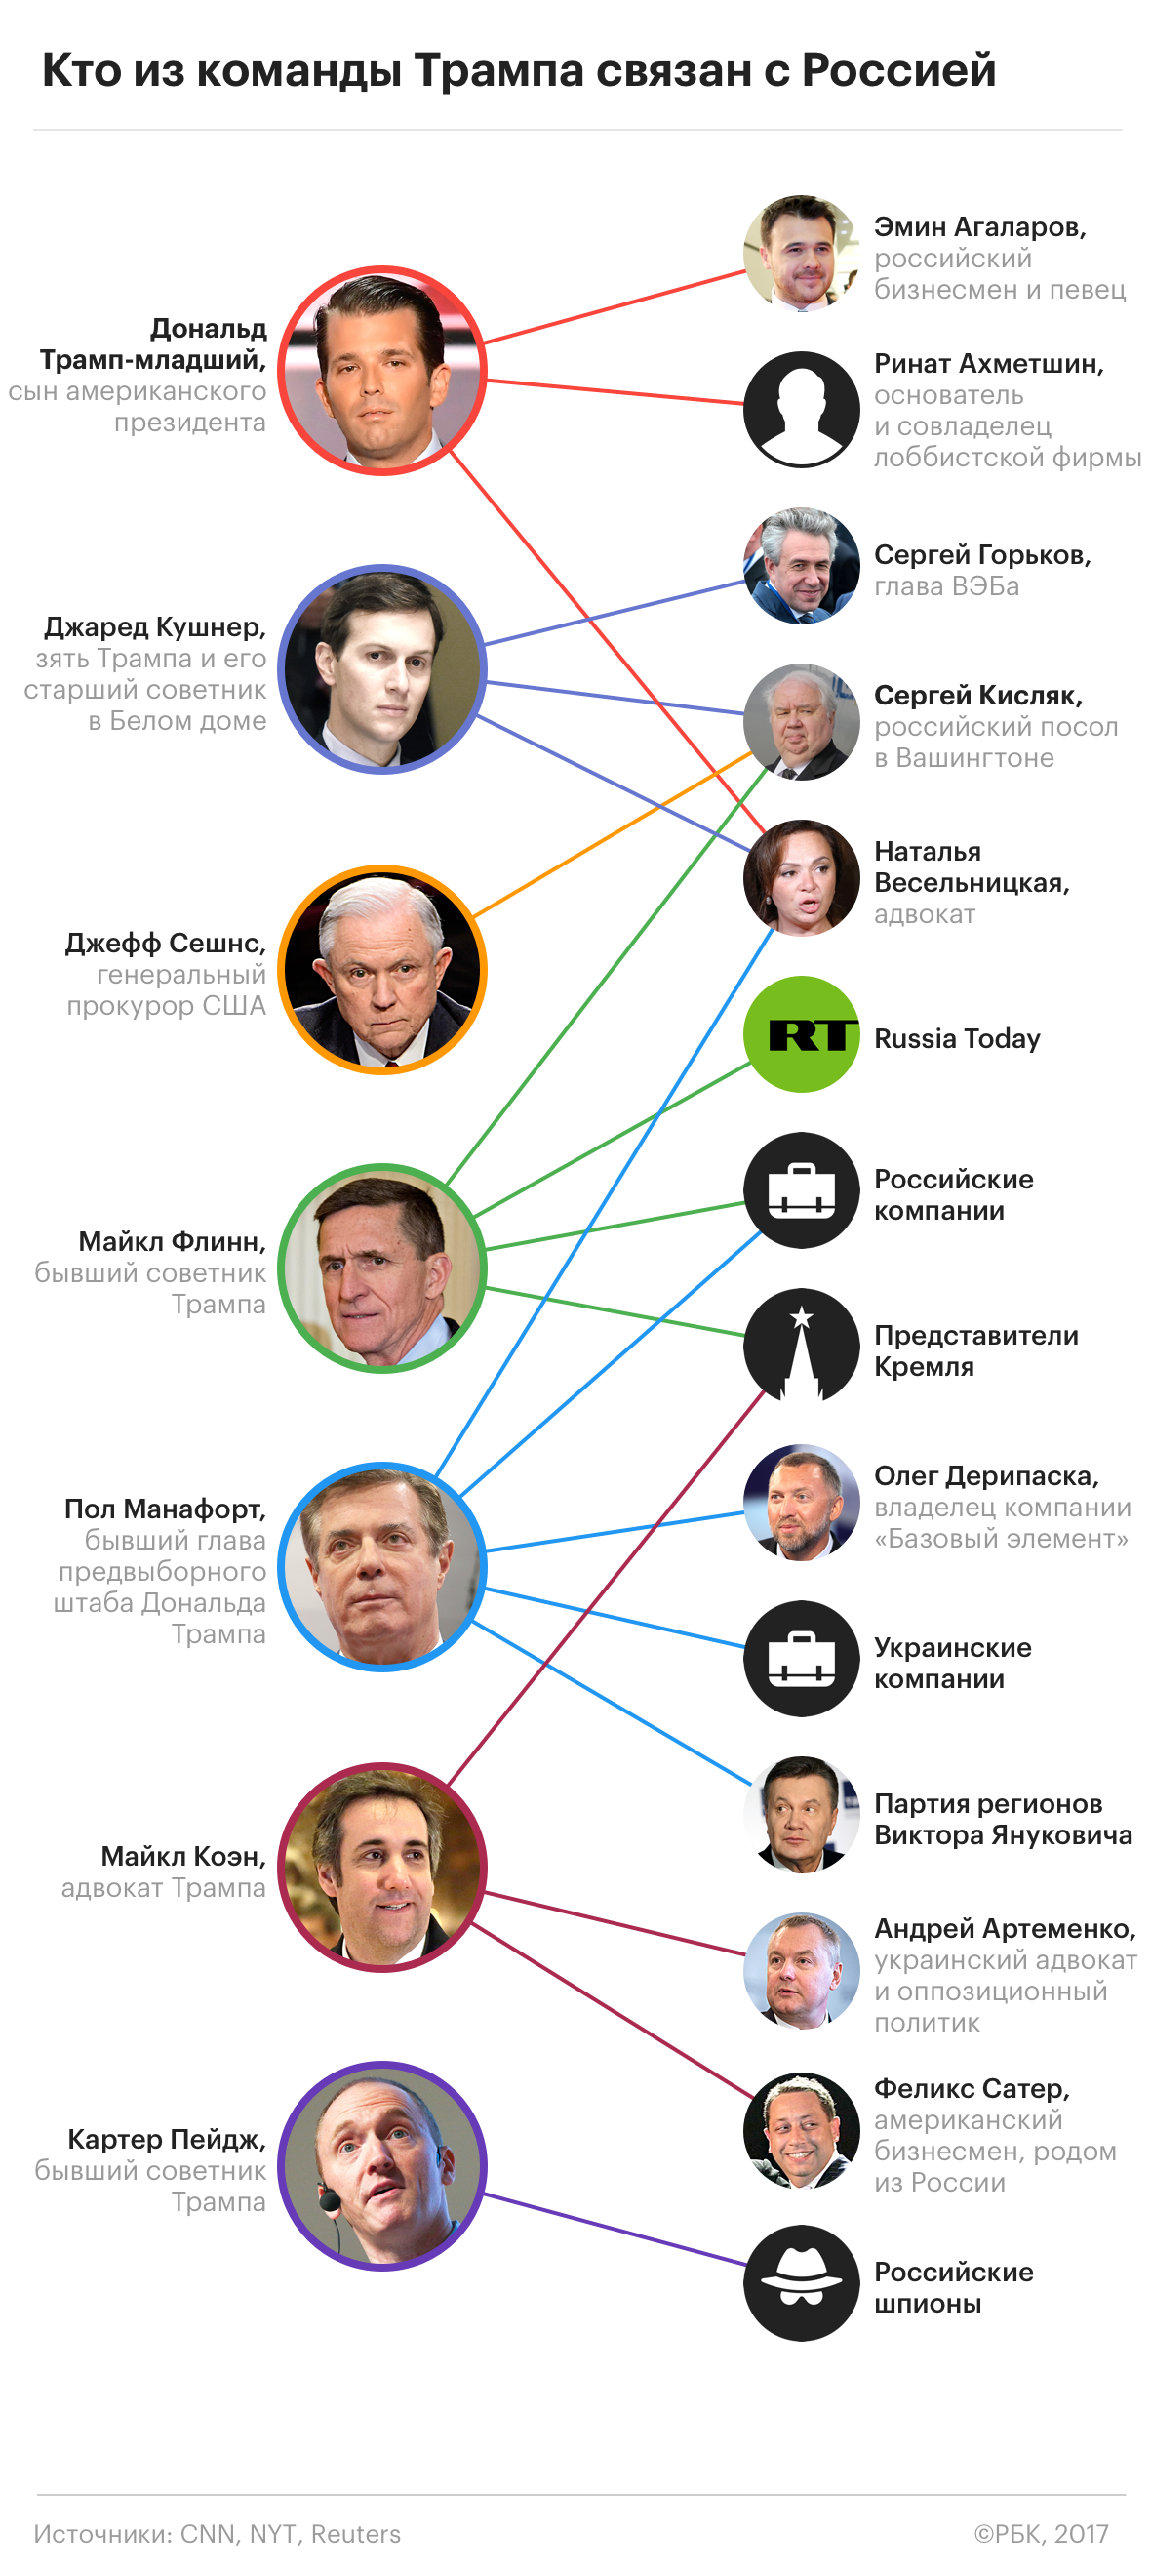 Связи с Россией